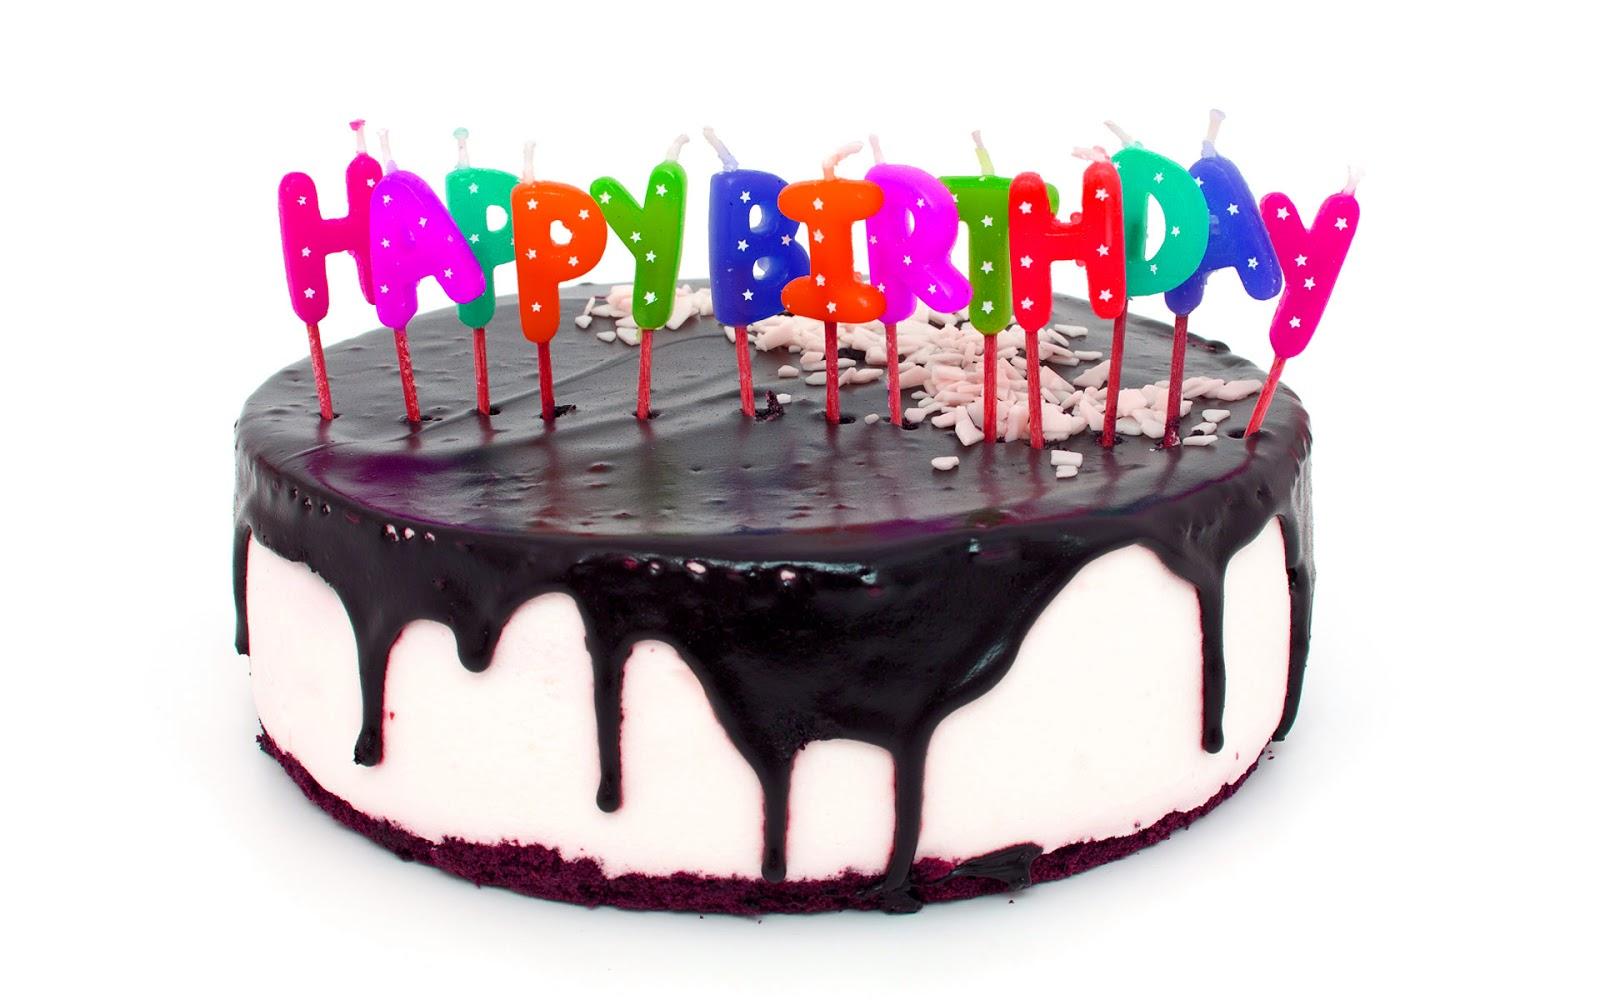 Gambar Kue Ulang Tahun Lengkap - Gambar Foto